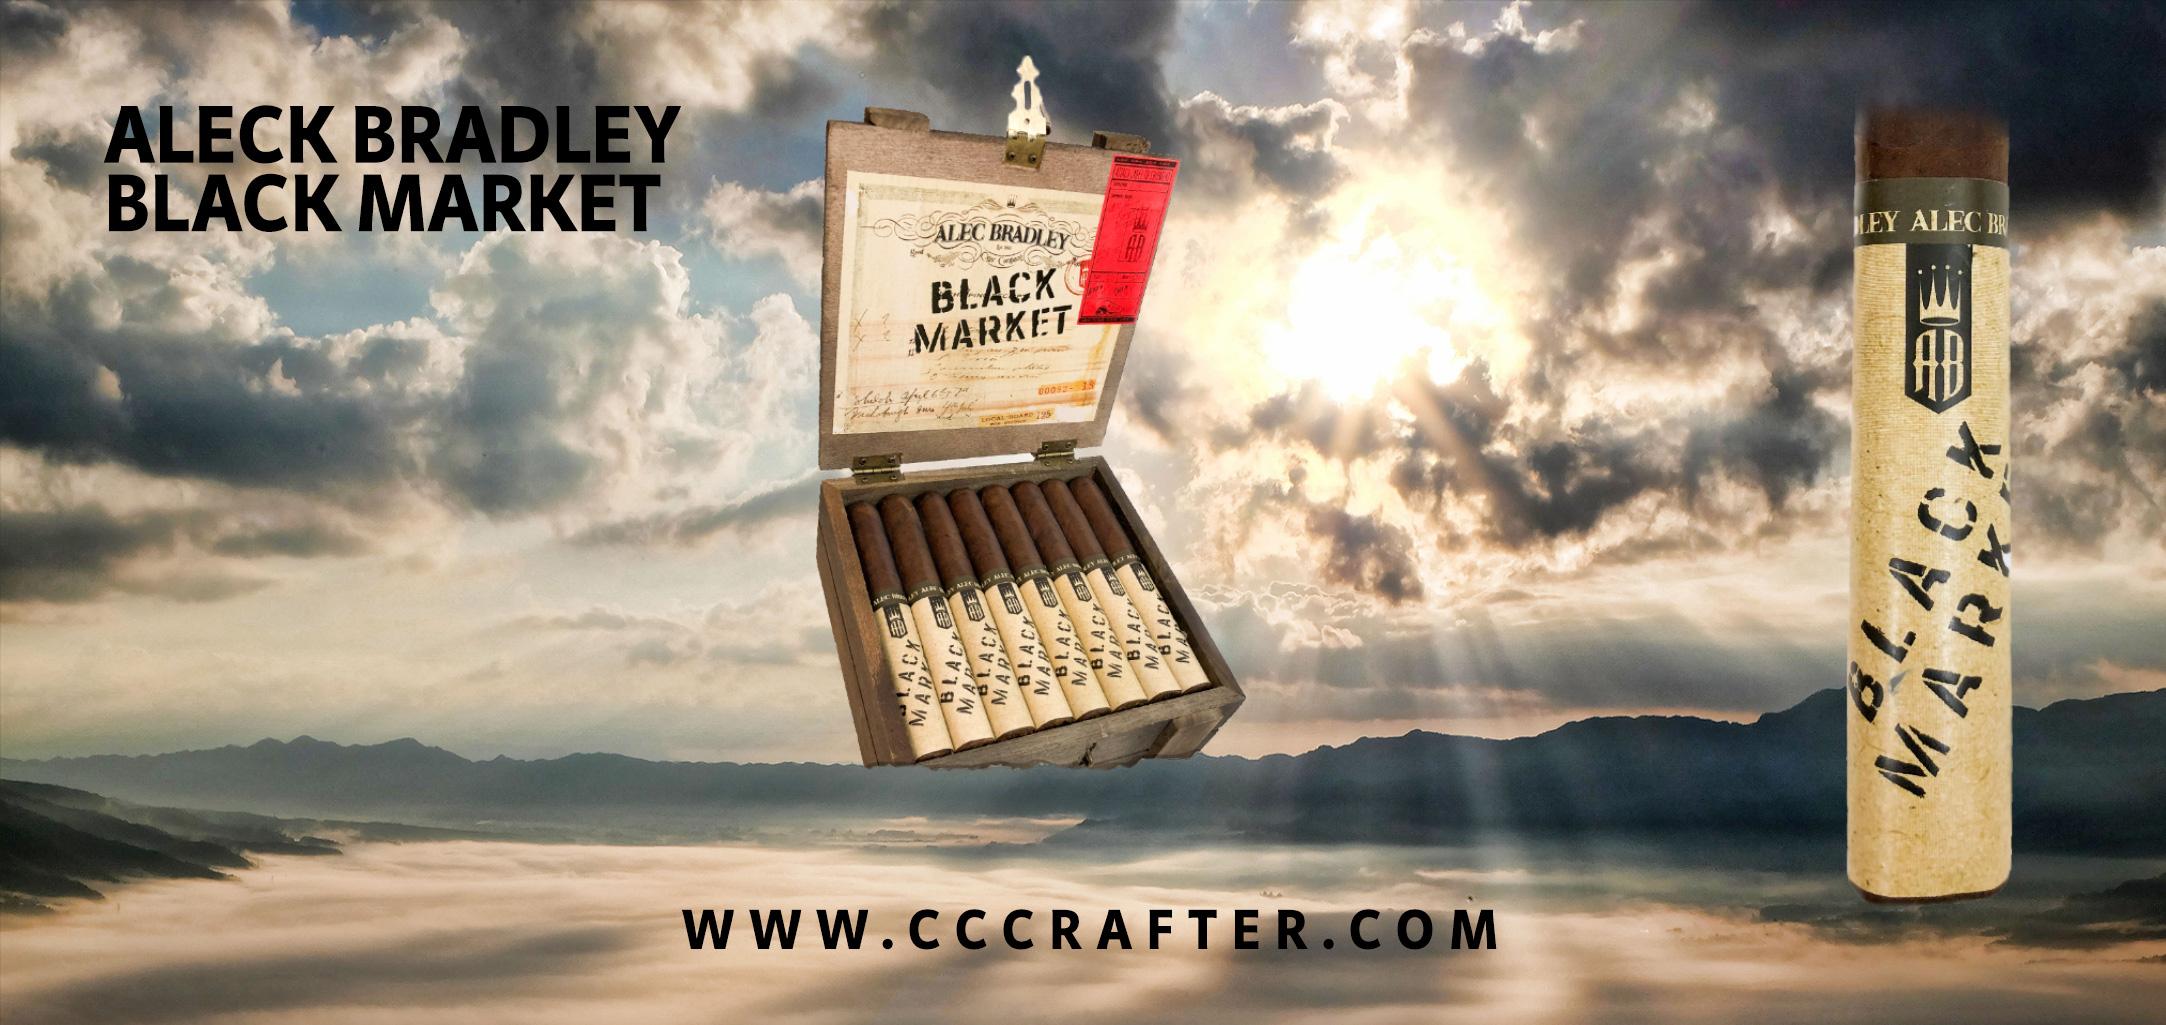 aleck-bradley-black-market.jpg